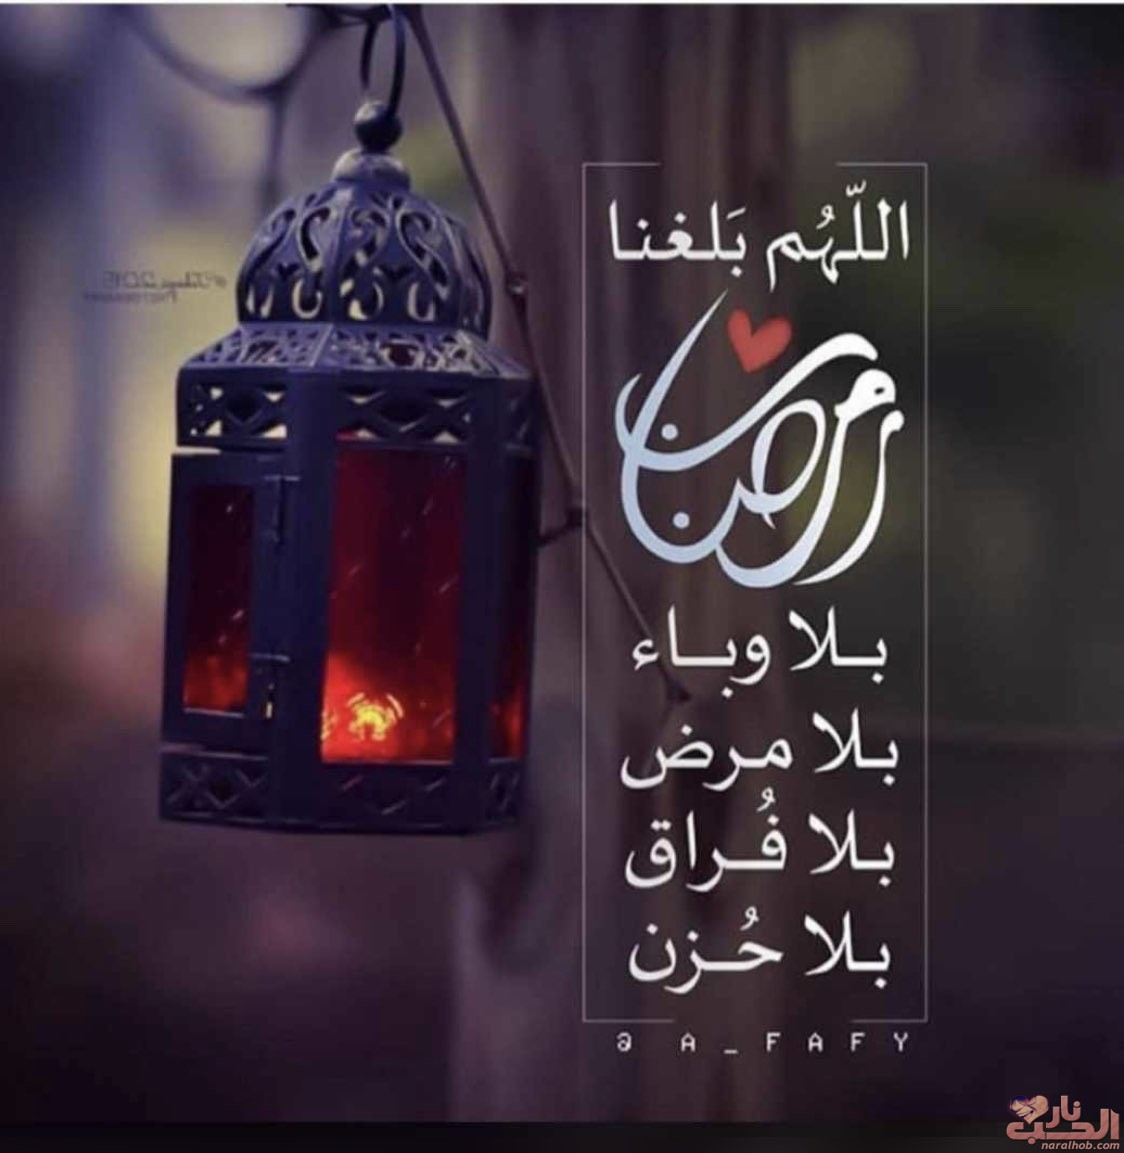 رسائل رمضانيه تويتر 2020 رسائل تهنئه لشهر رمضان